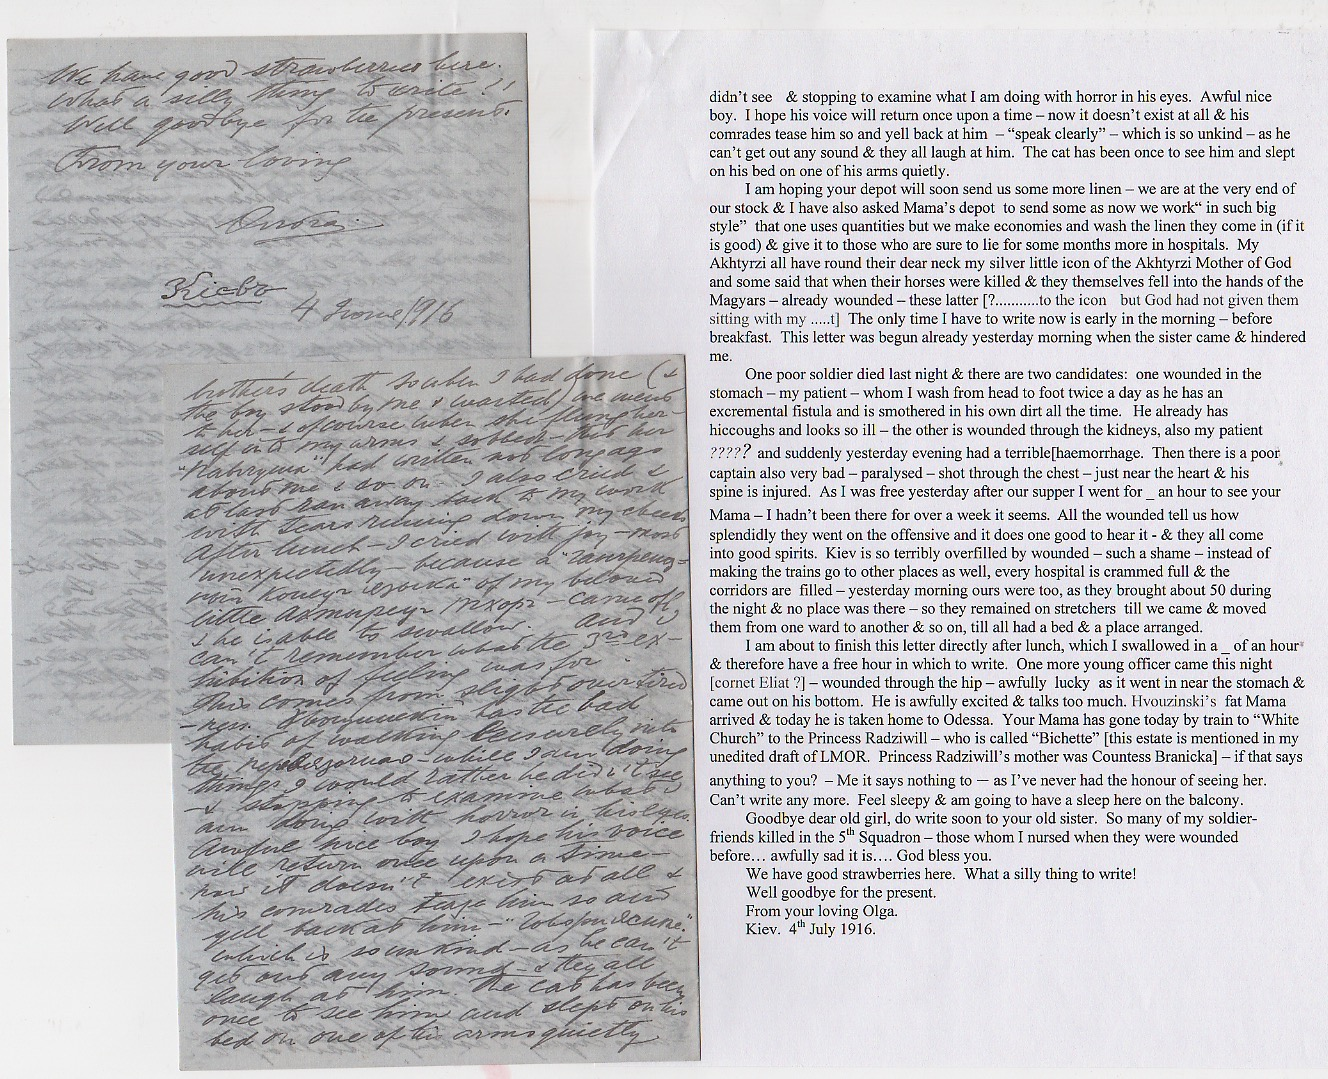 Royalty Grand Duchess Olga Correspondence To Her Sister Grand Duchess Xenia 1916-1920 - Image 31 of 47